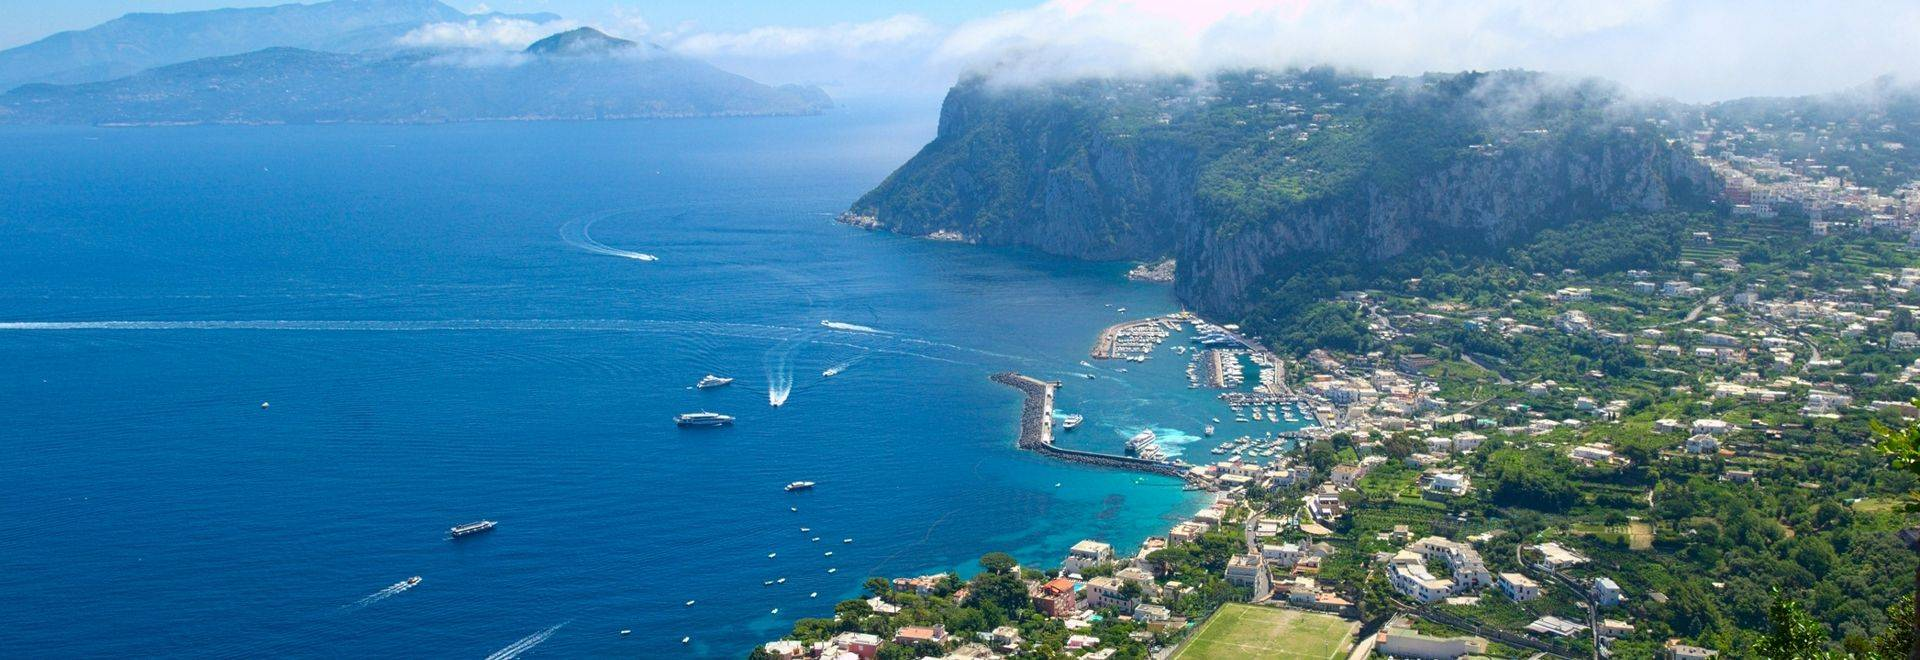 Dreamstime M 32041424 Capri